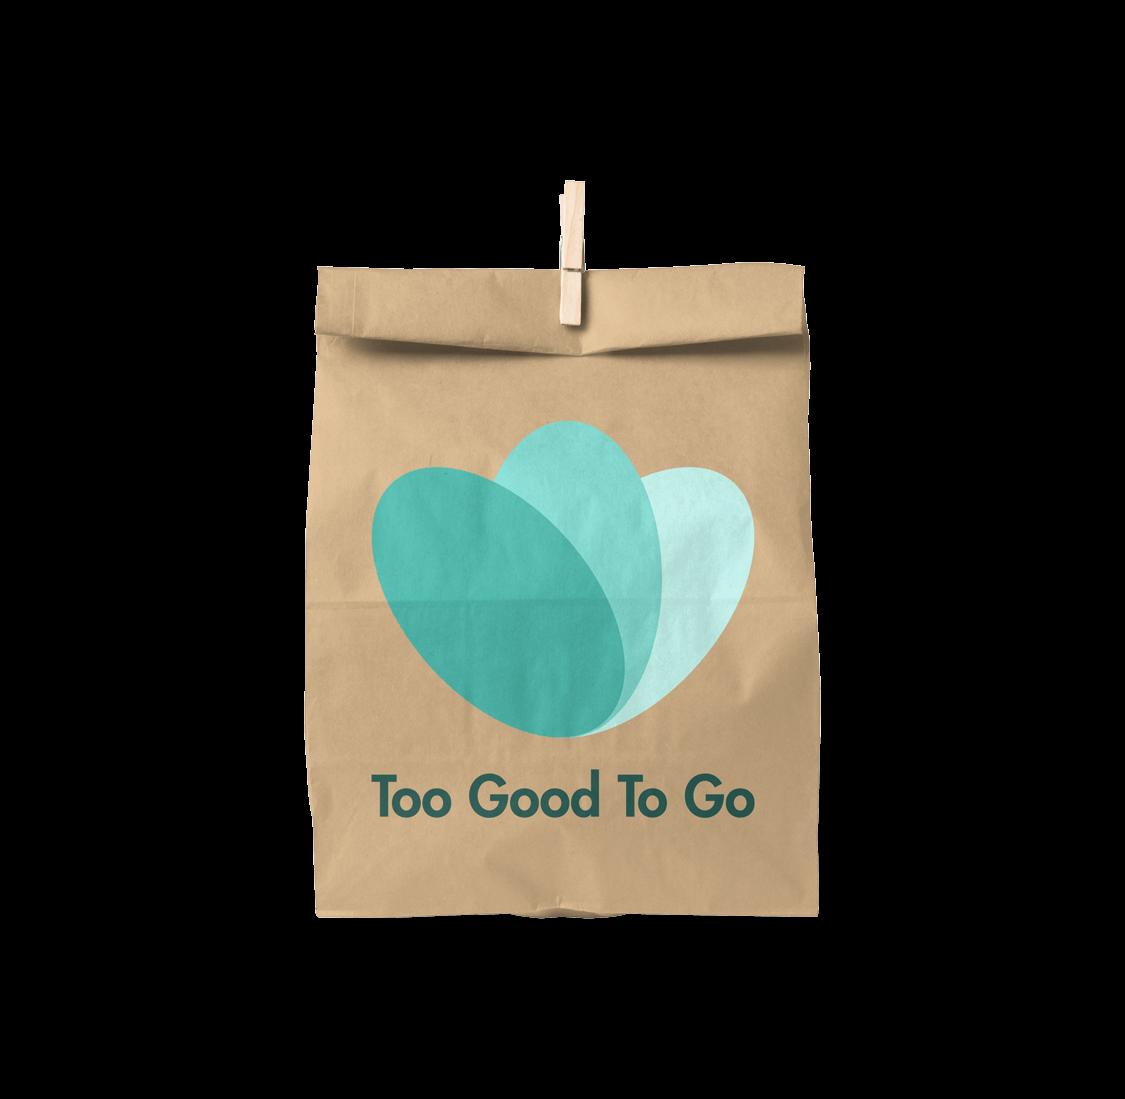 تطبيق هدر الطعام   Too Good ToGo